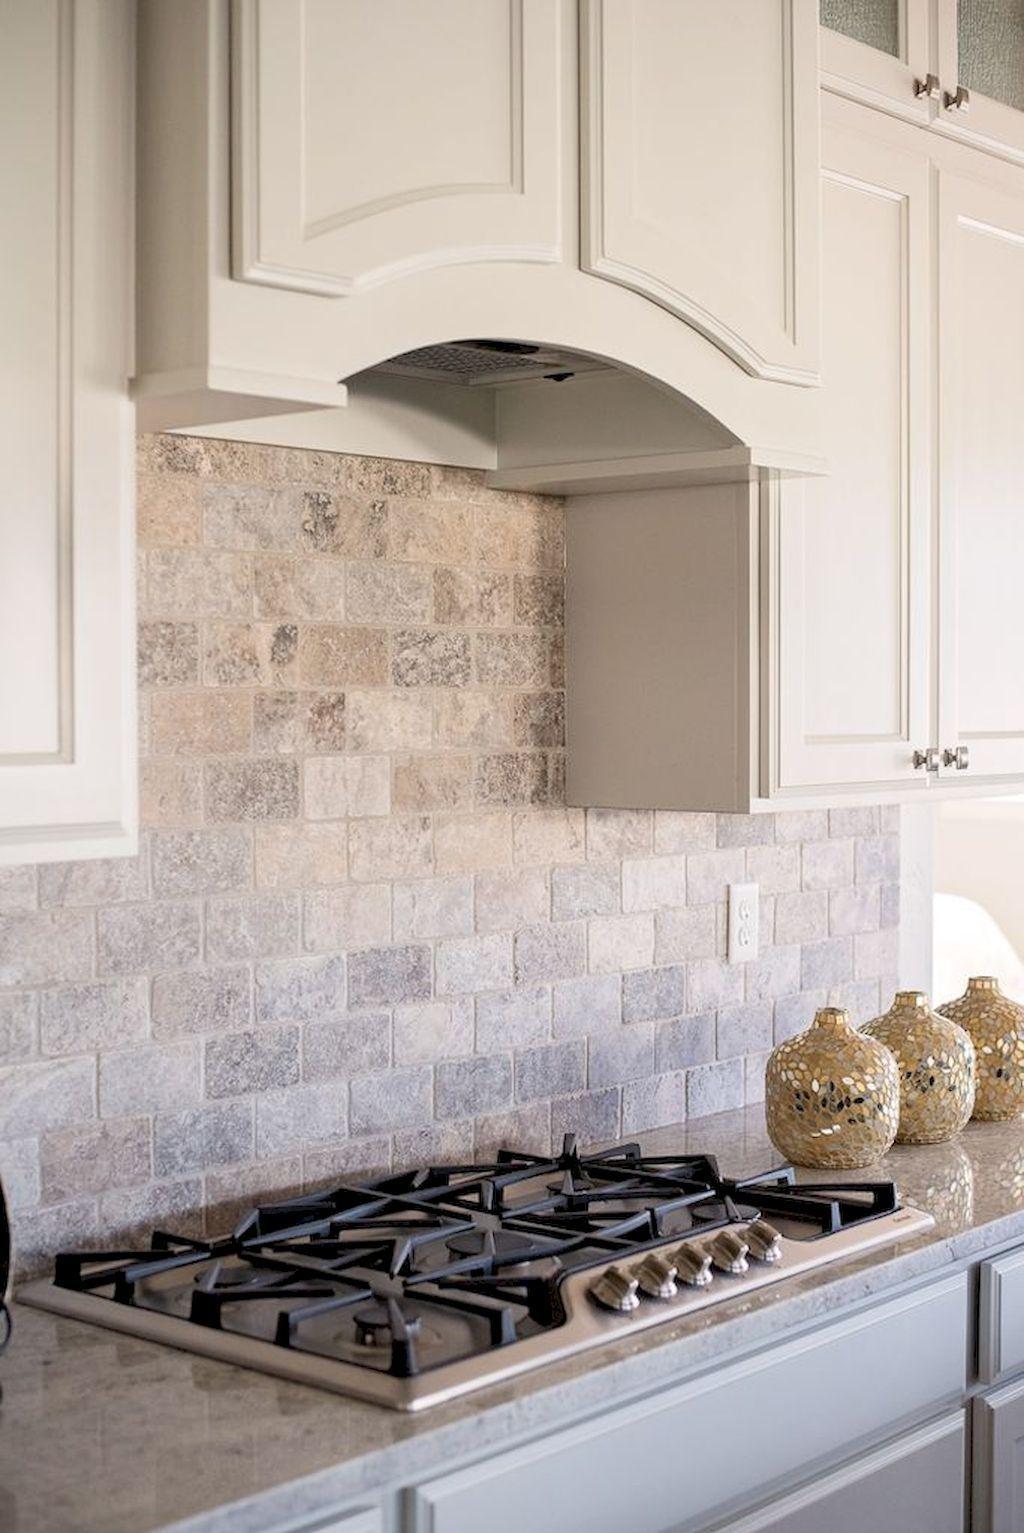 Gorgeous Kitchen Backsplah Tile Ideas 41 Home Decor Ideas